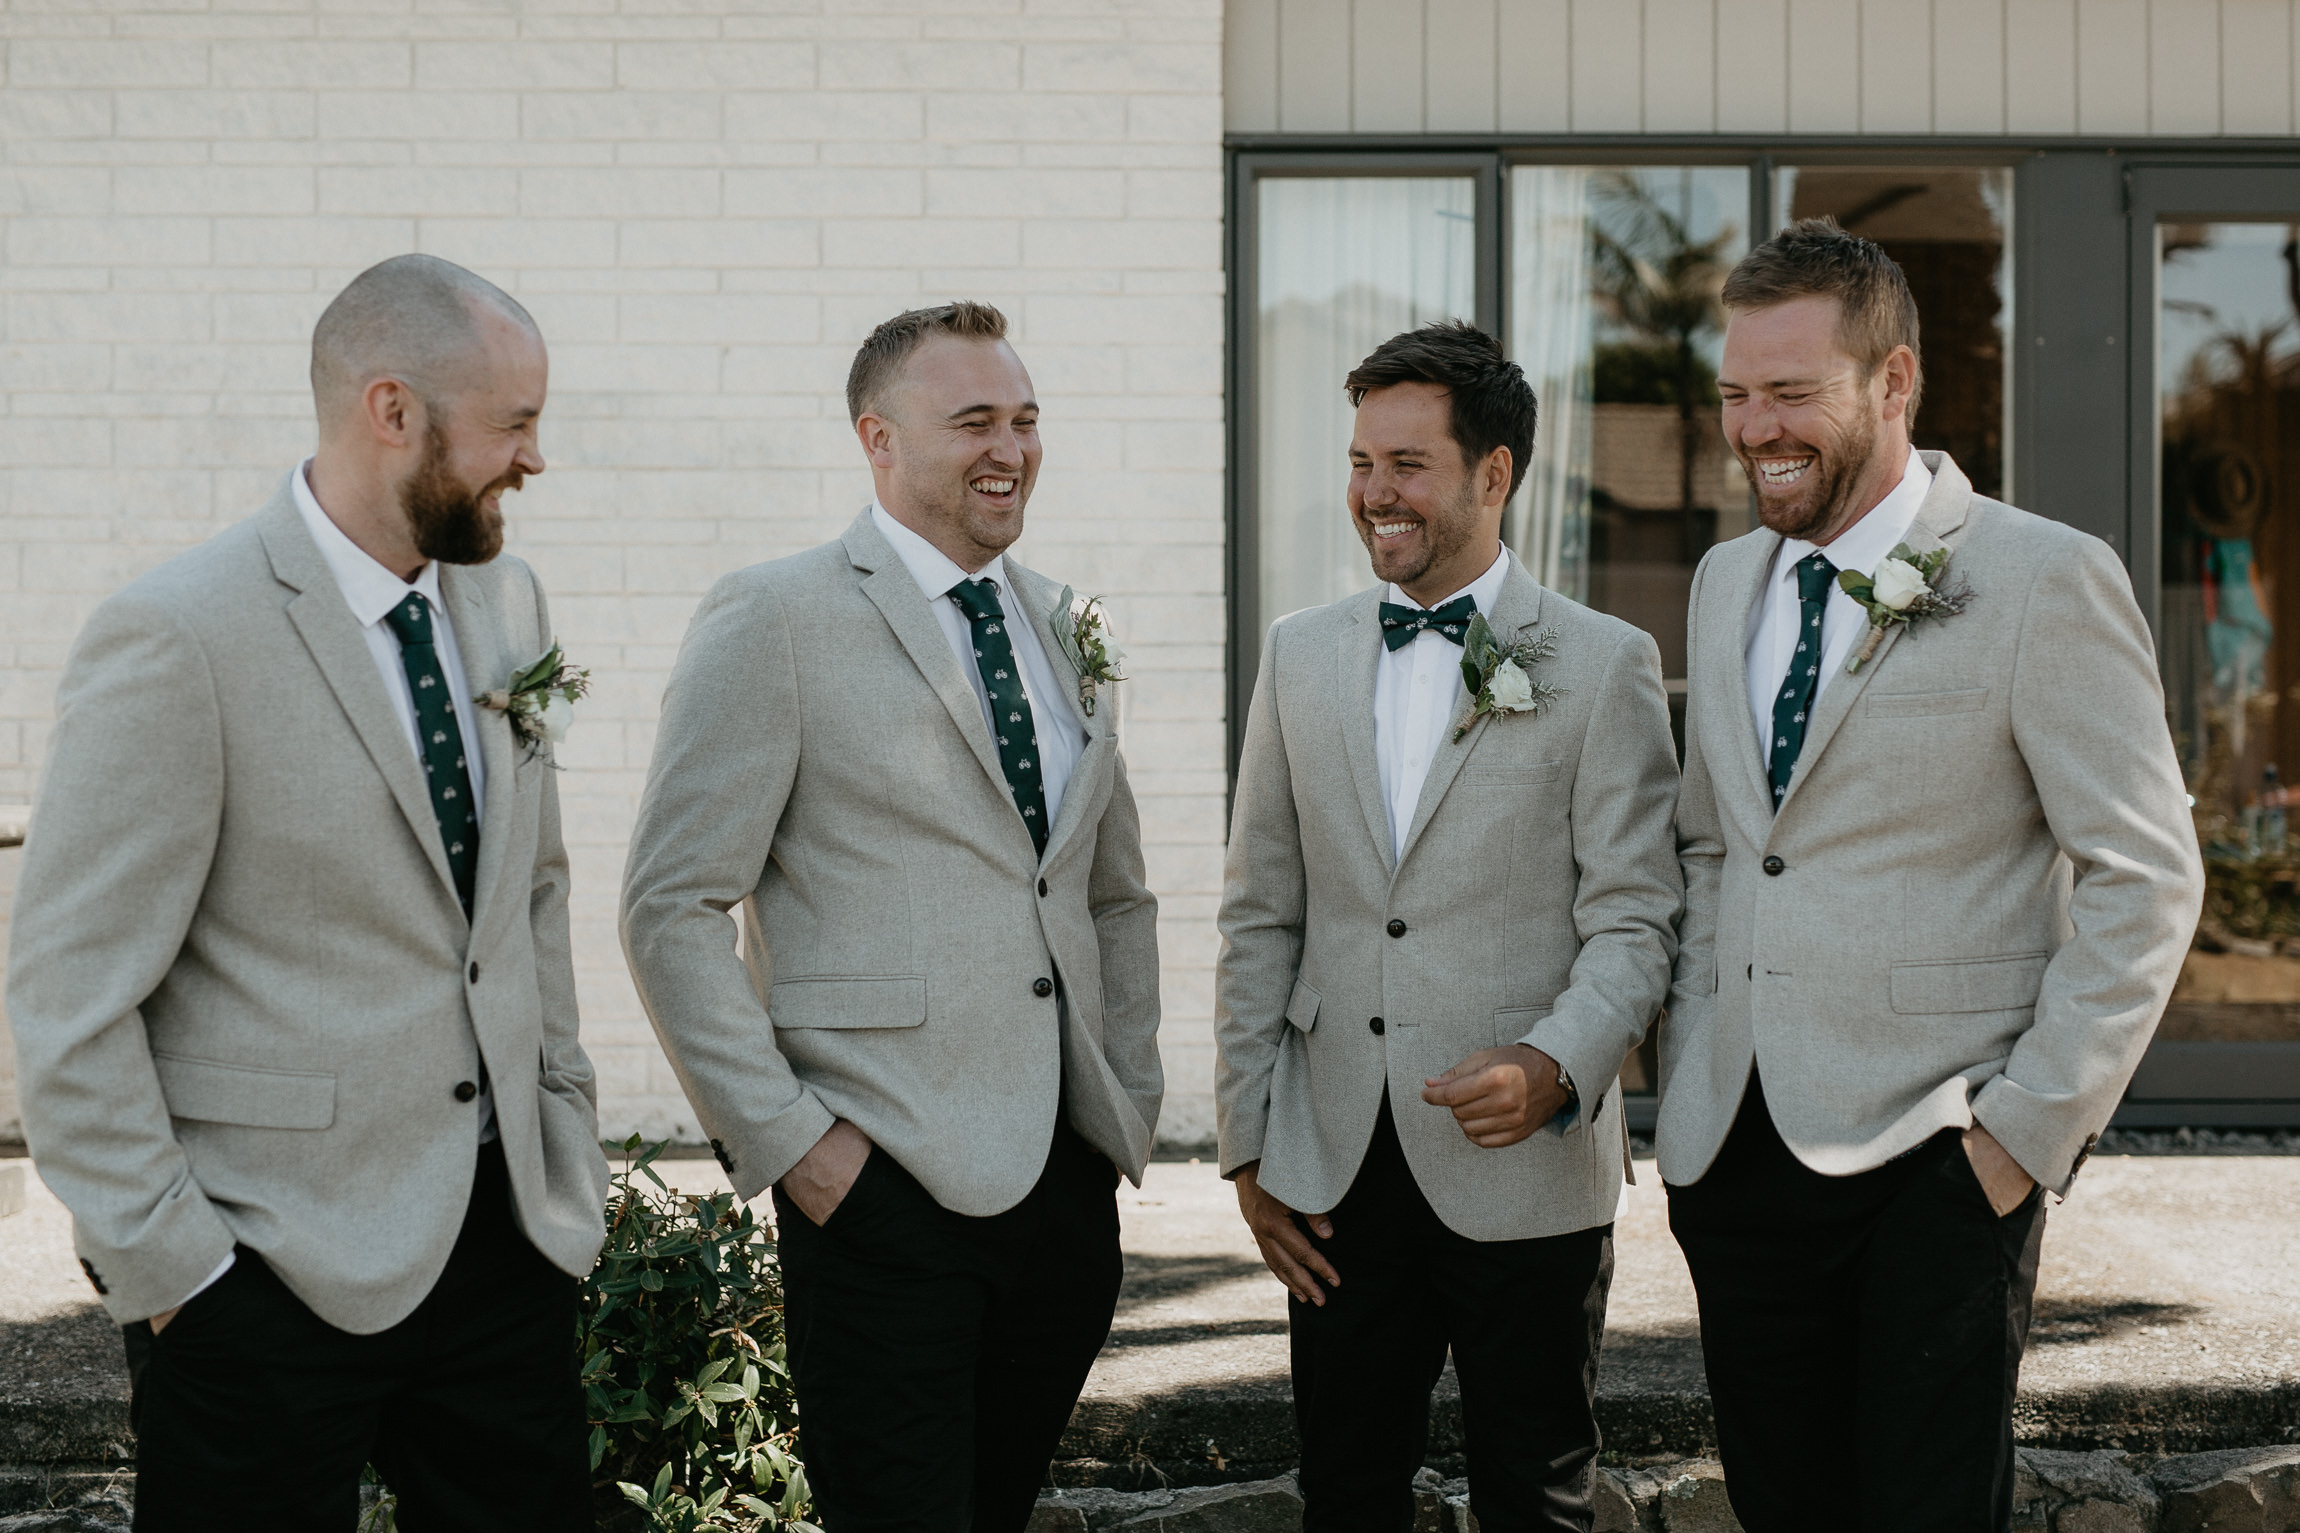 oldforestschool-wedding-blog-38.jpg